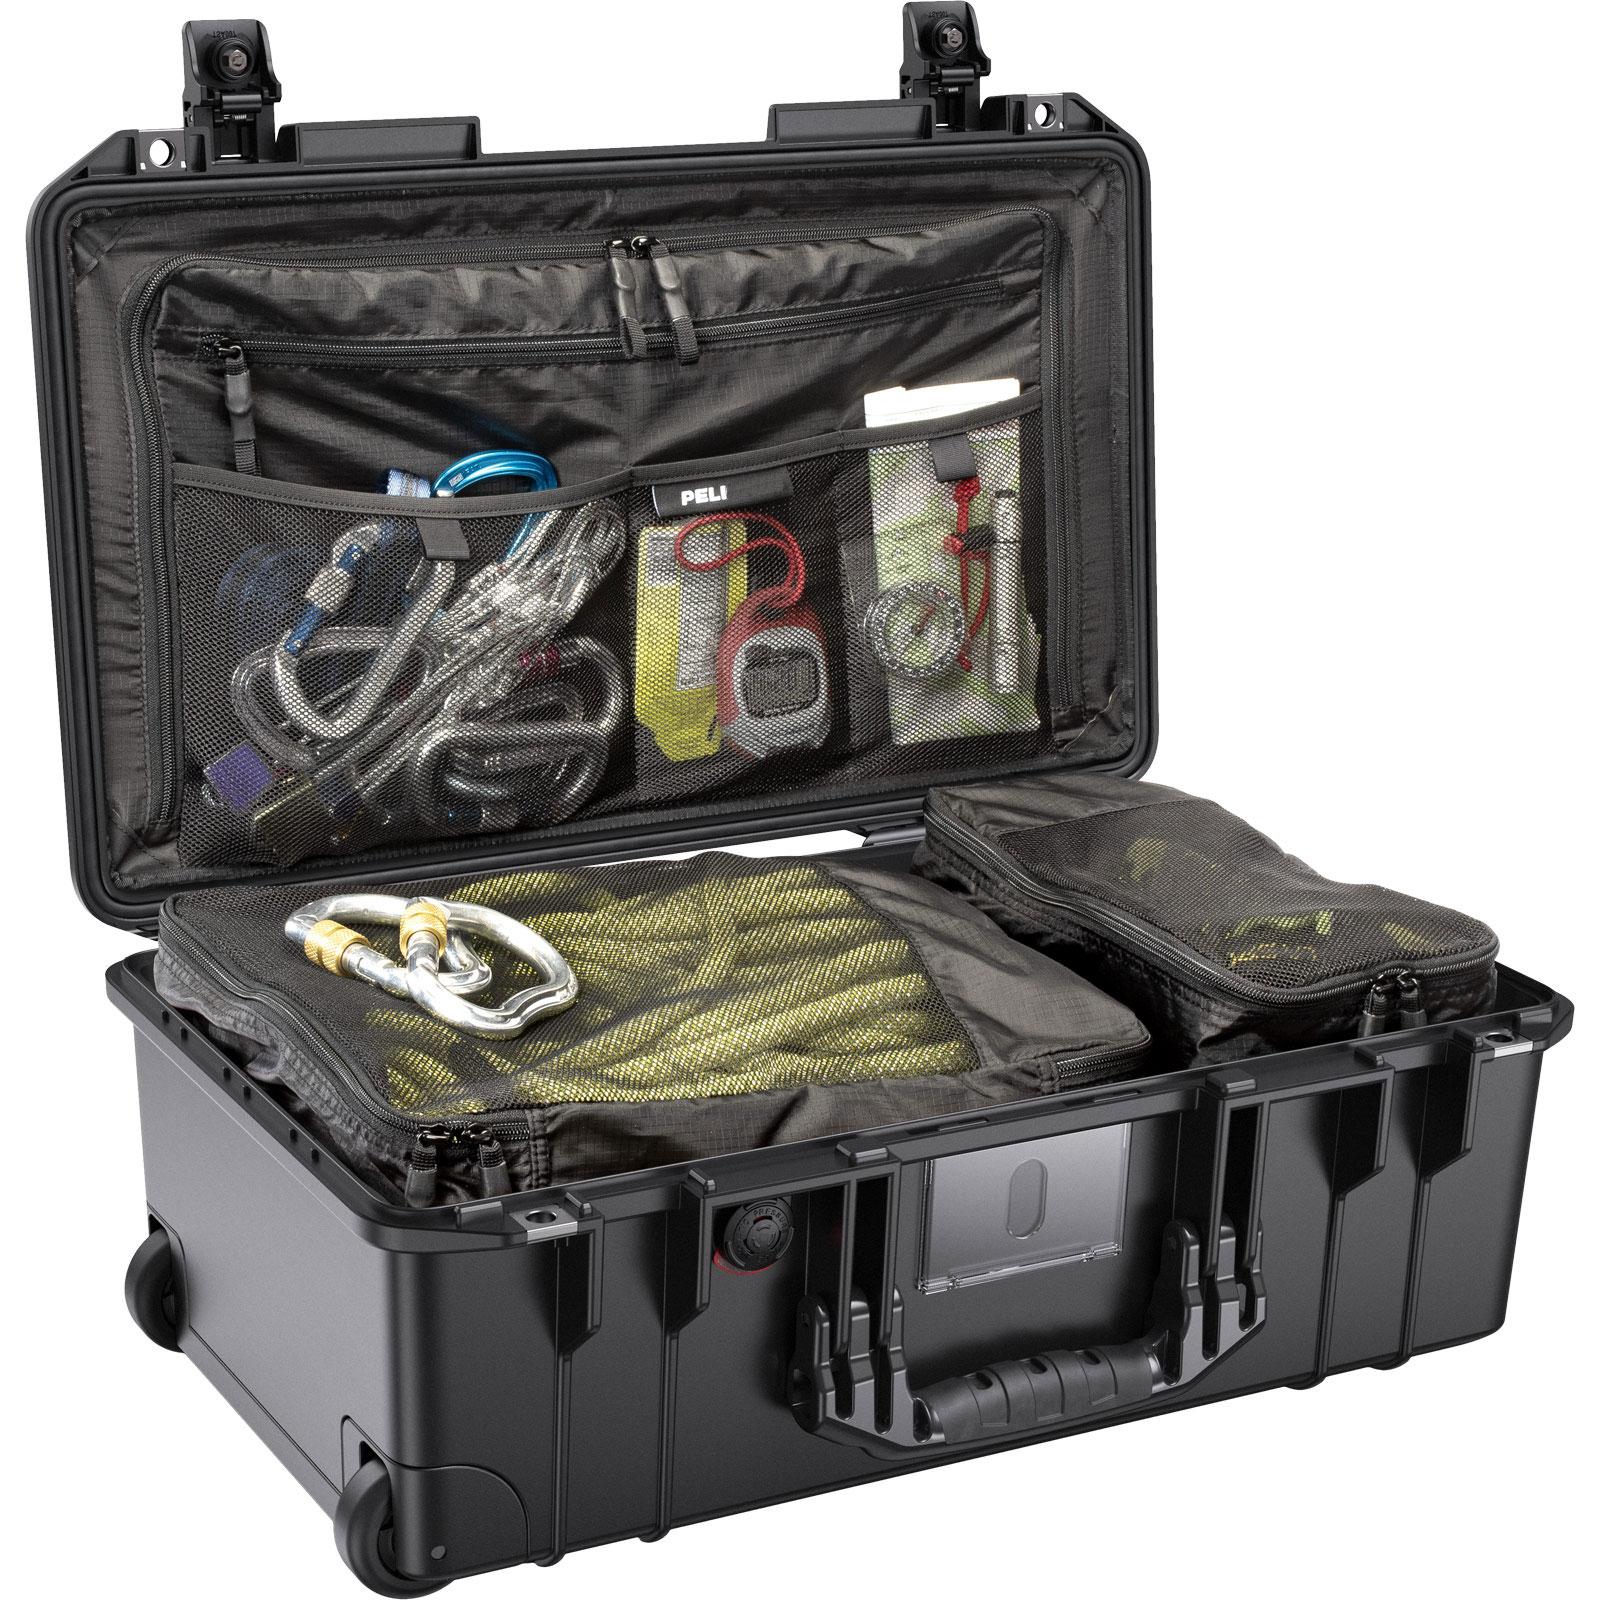 peli 1535 black tsa lock luggage case